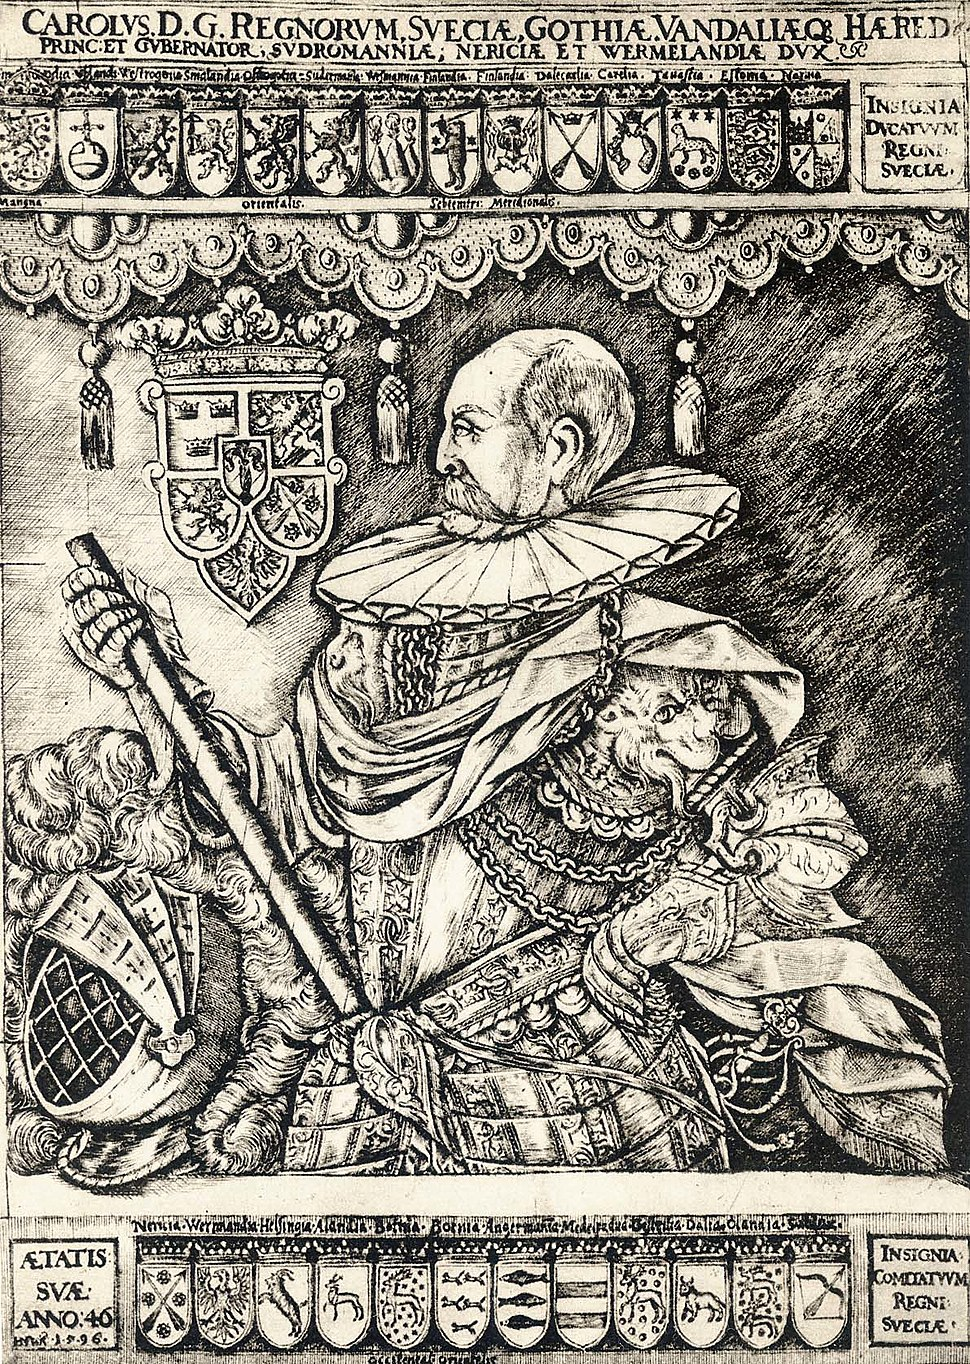 Carl IX of Sweden 1596 by H. N%C3%BCtzel